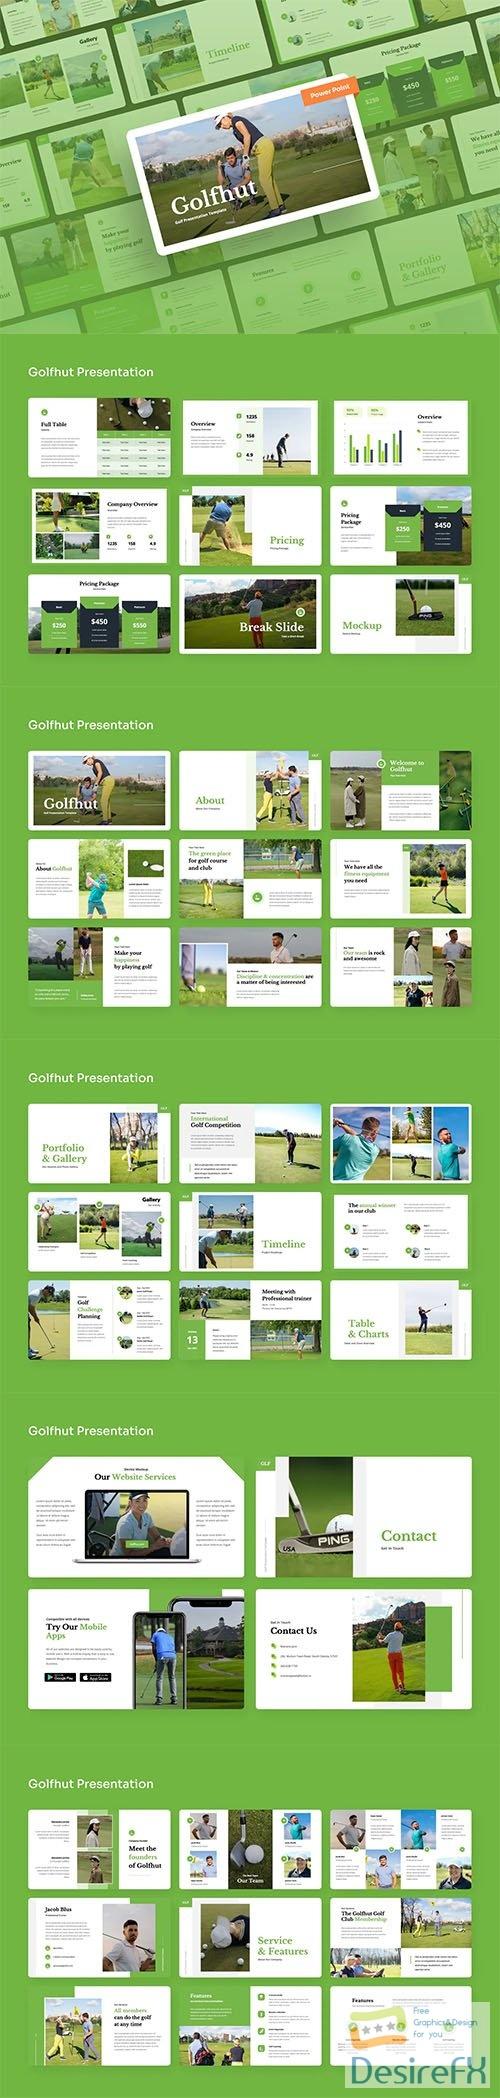 Golfhut - Golf Power Point Presentation